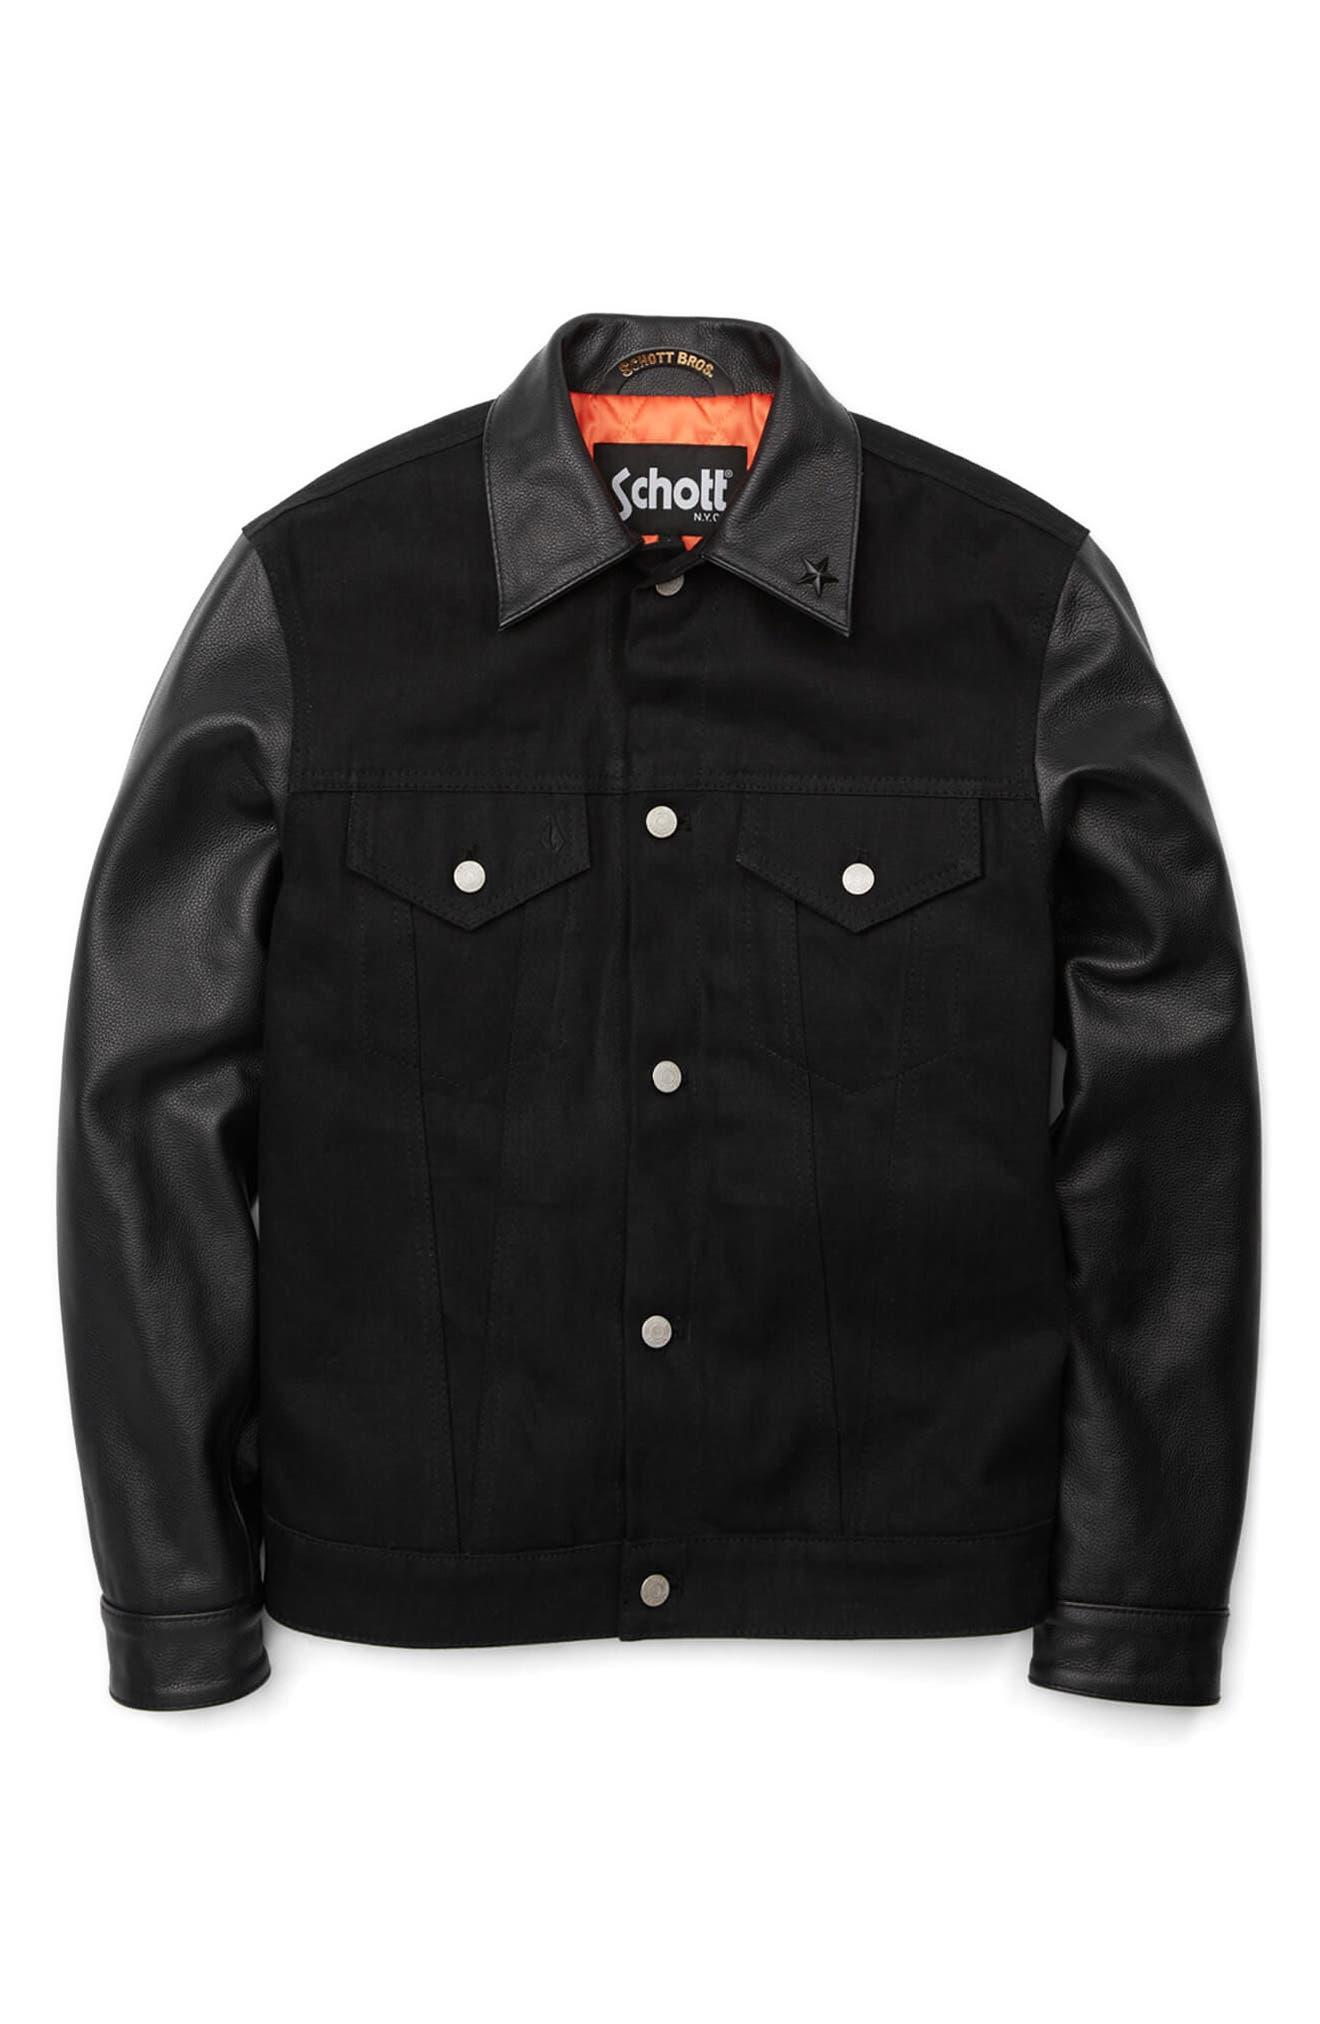 x Schott Denim Jacket,                             Alternate thumbnail 6, color,                             Black